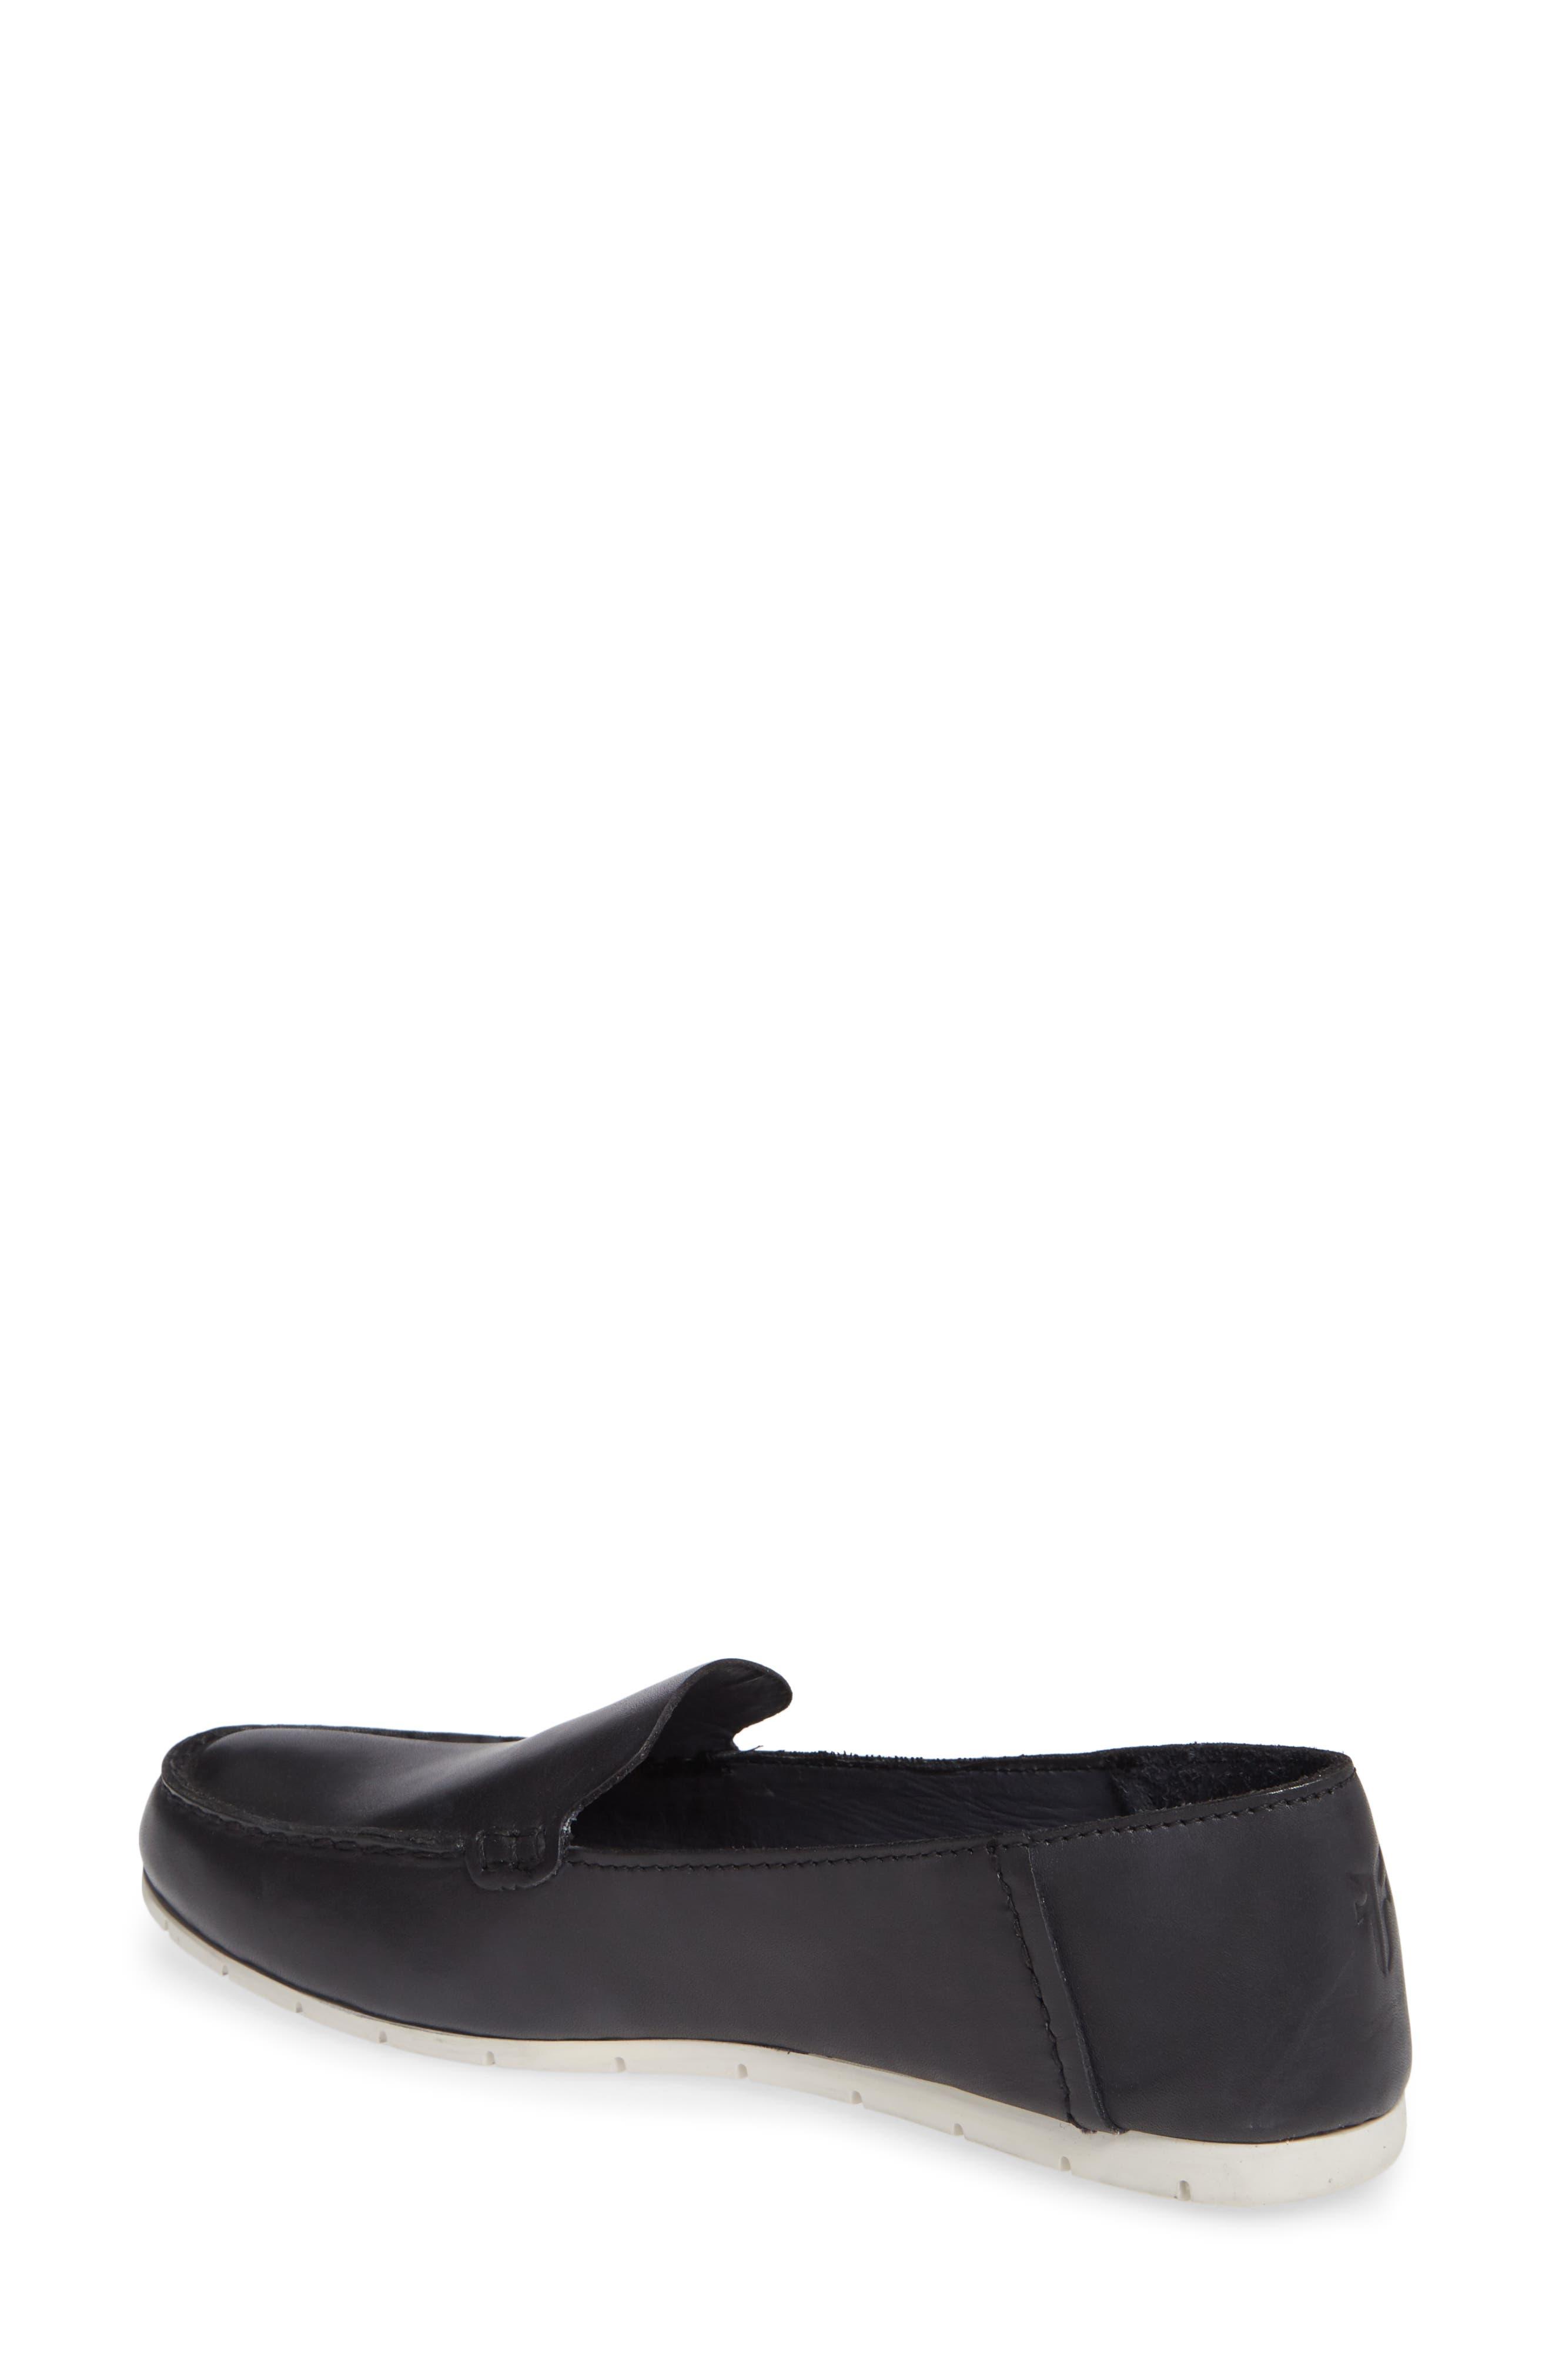 Sedona Venetian Loafer,                             Alternate thumbnail 2, color,                             BLACK LEATHER